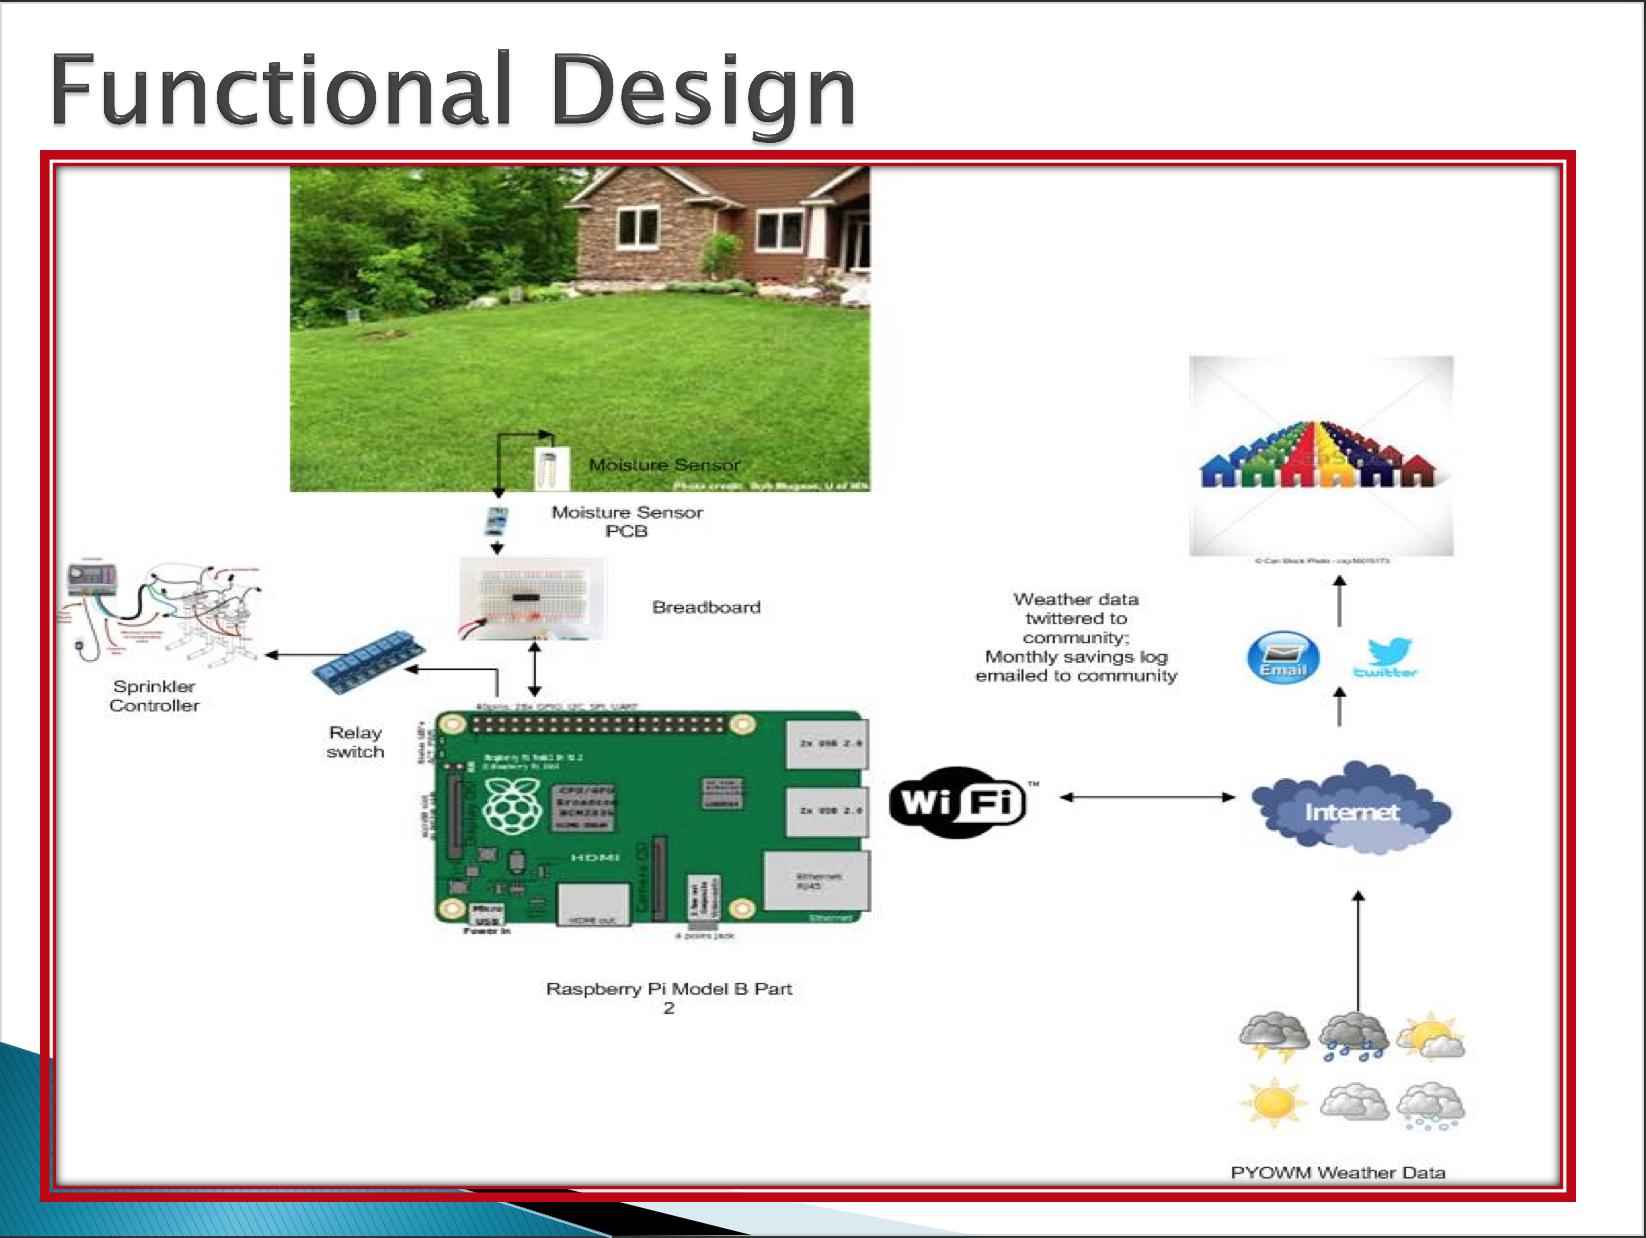 IoT community sprinkler system using Raspberry Pi | The MagPi issue